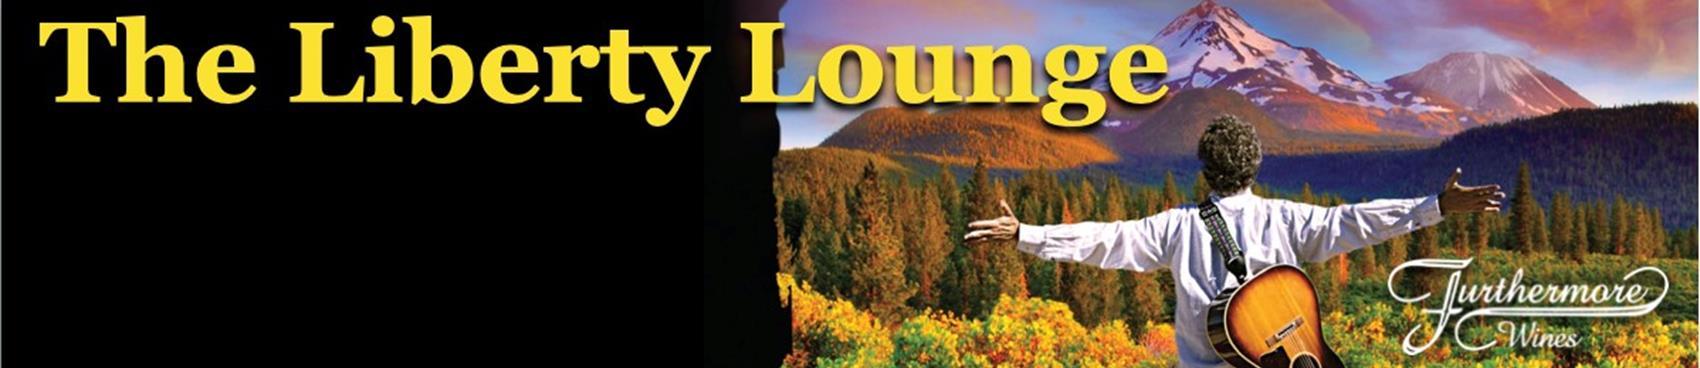 The Liberty Lounge with Glenn Siegel